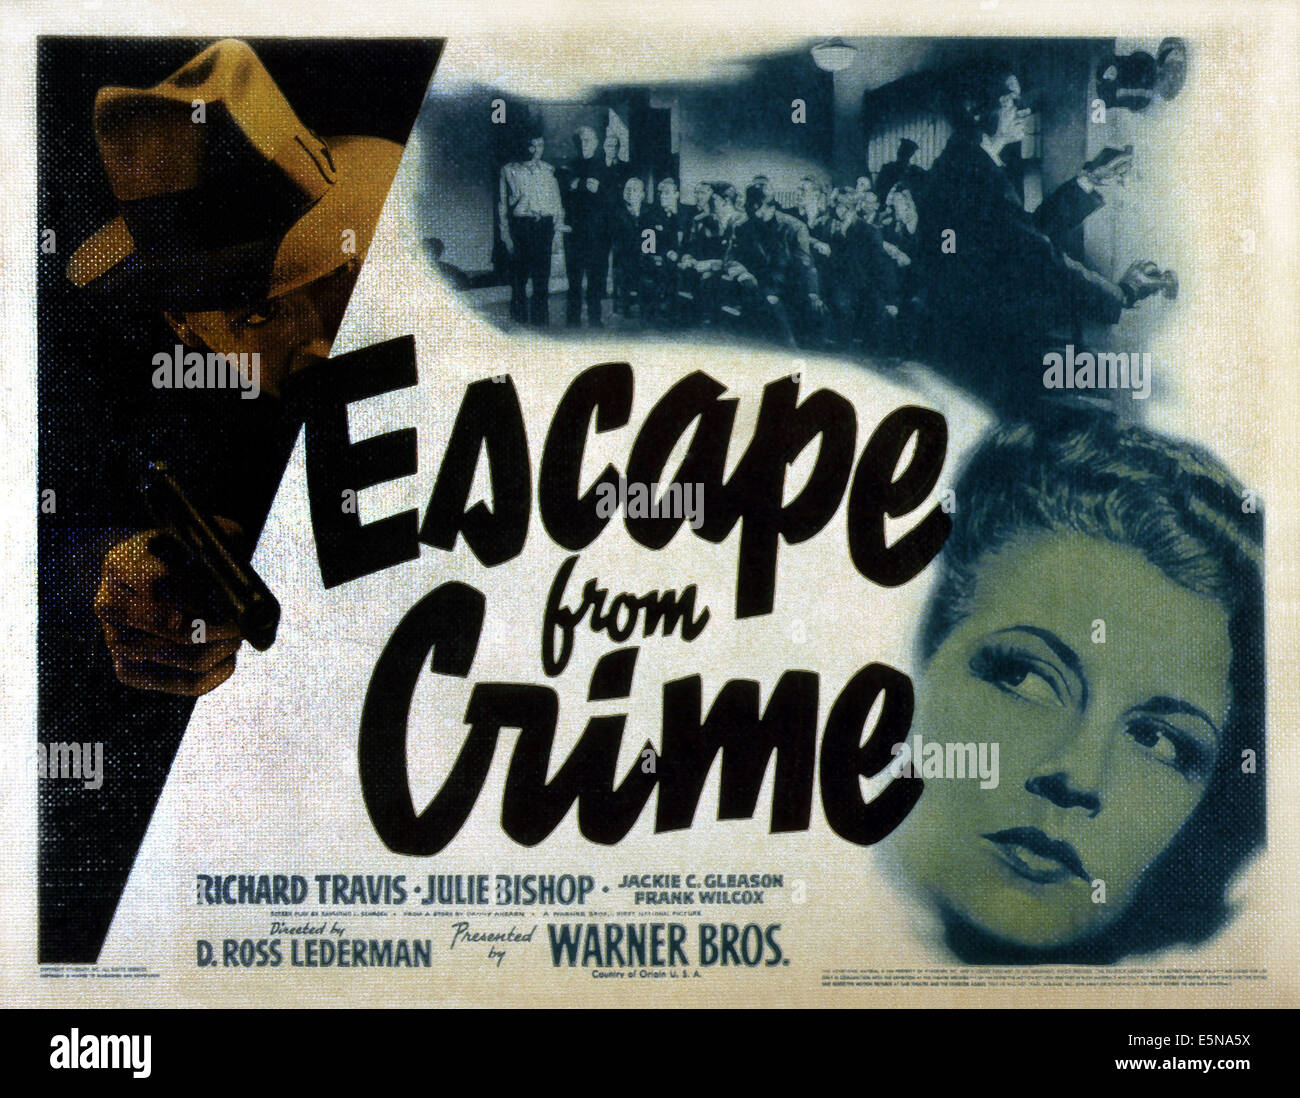 ESCAPE FROM CRIME, Julie Bishop (bottom right), 1942 - Stock Image